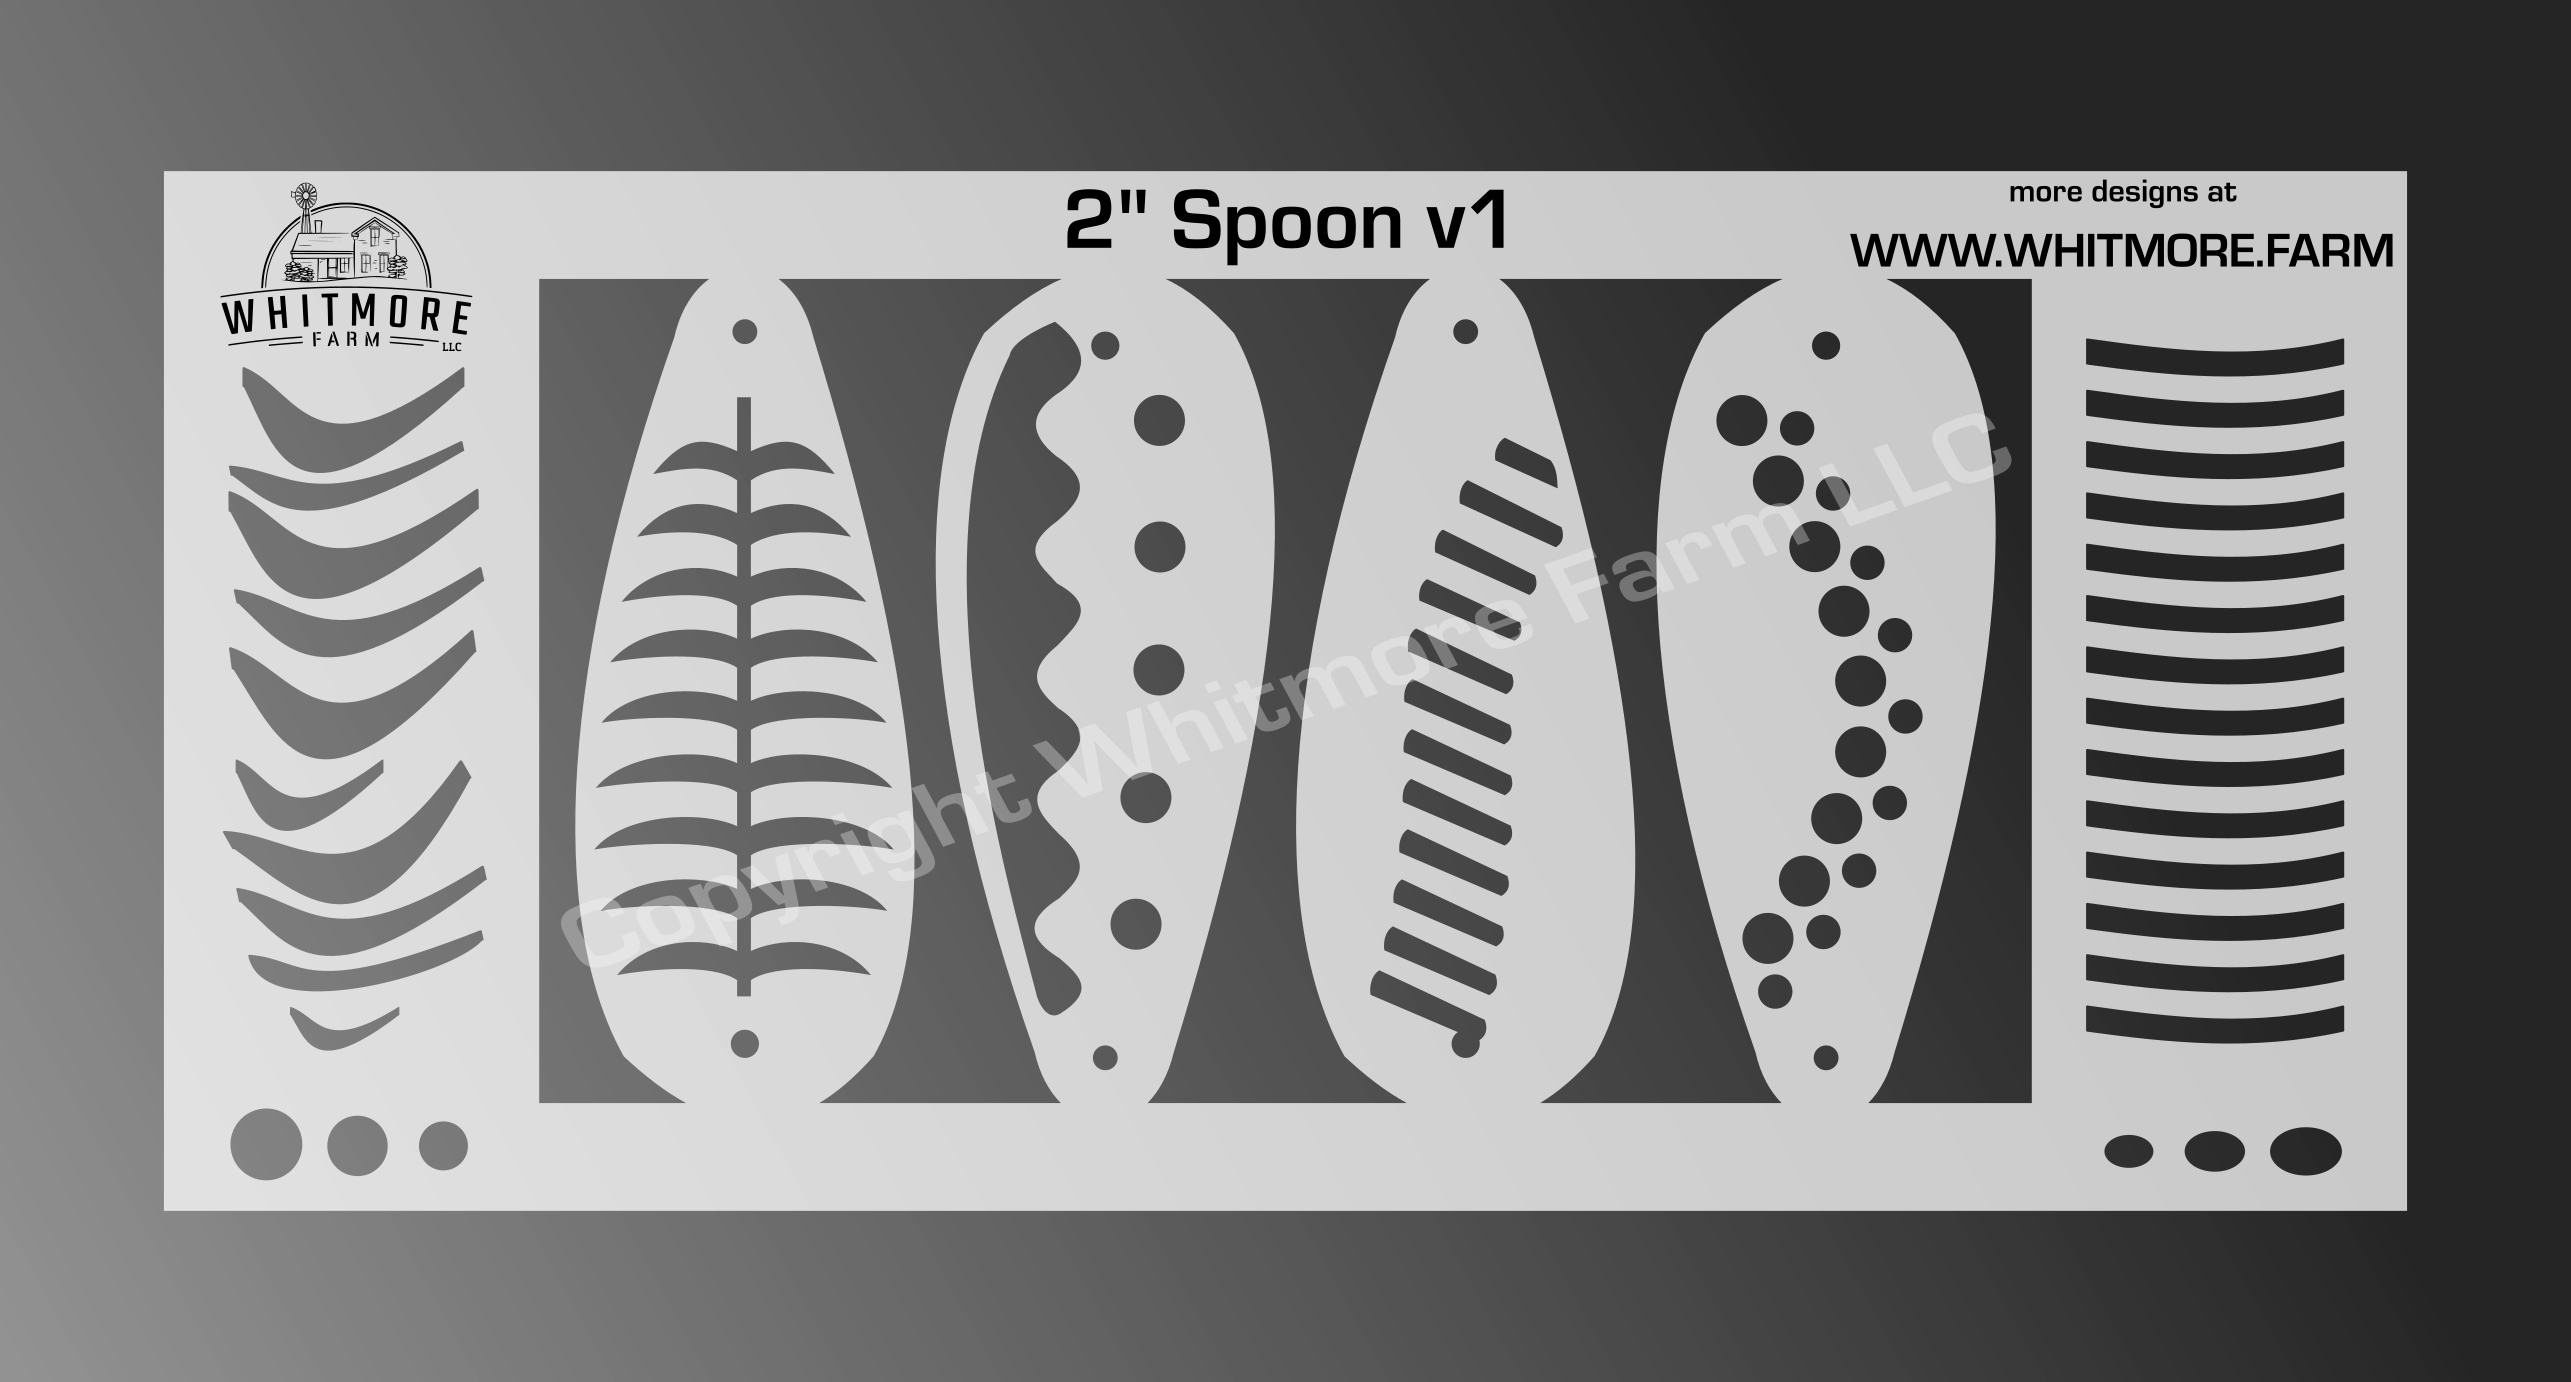 2 Inch Spoon fishing lure airbrush stencil